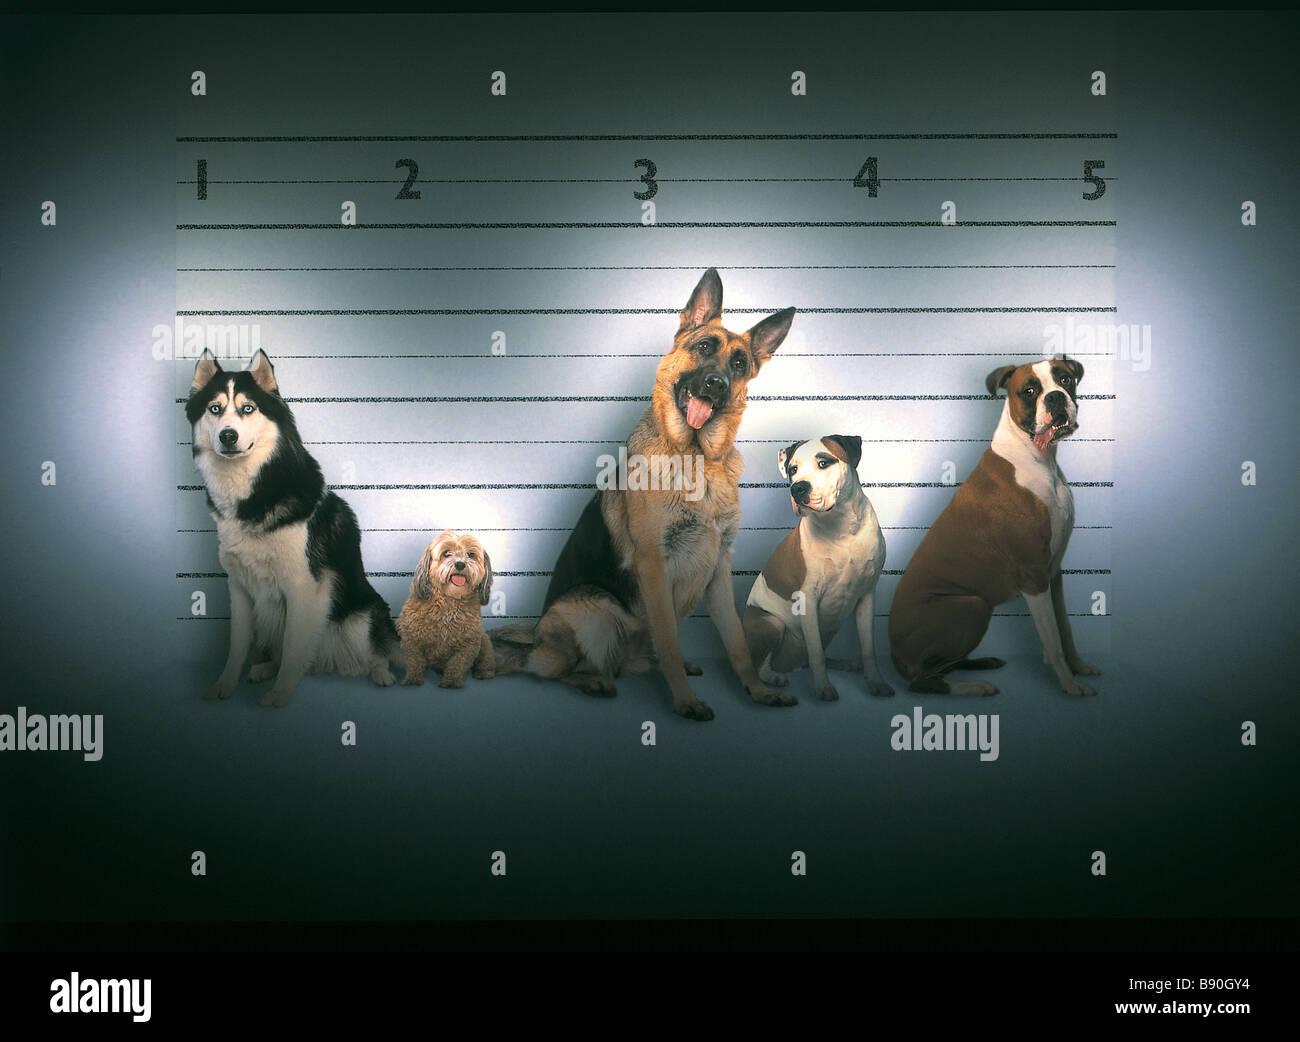 FL3053, KITCHIN/HURST penale line-up bad cani Immagini Stock